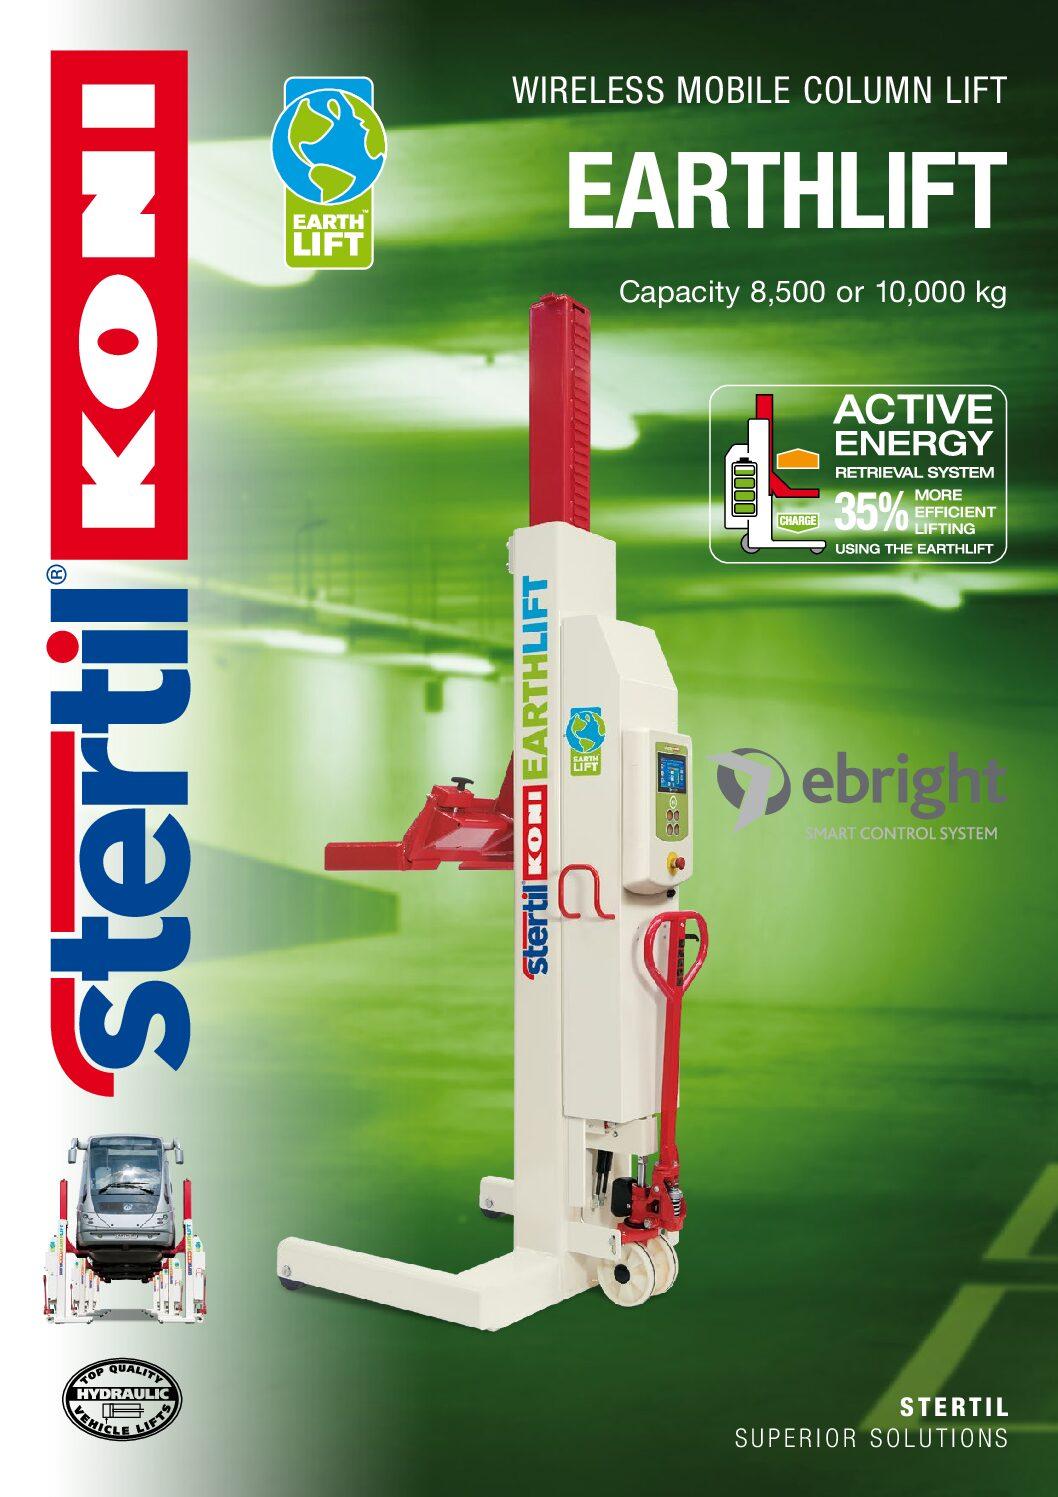 Stertil-Koni: EARTHLIFT – GB Version